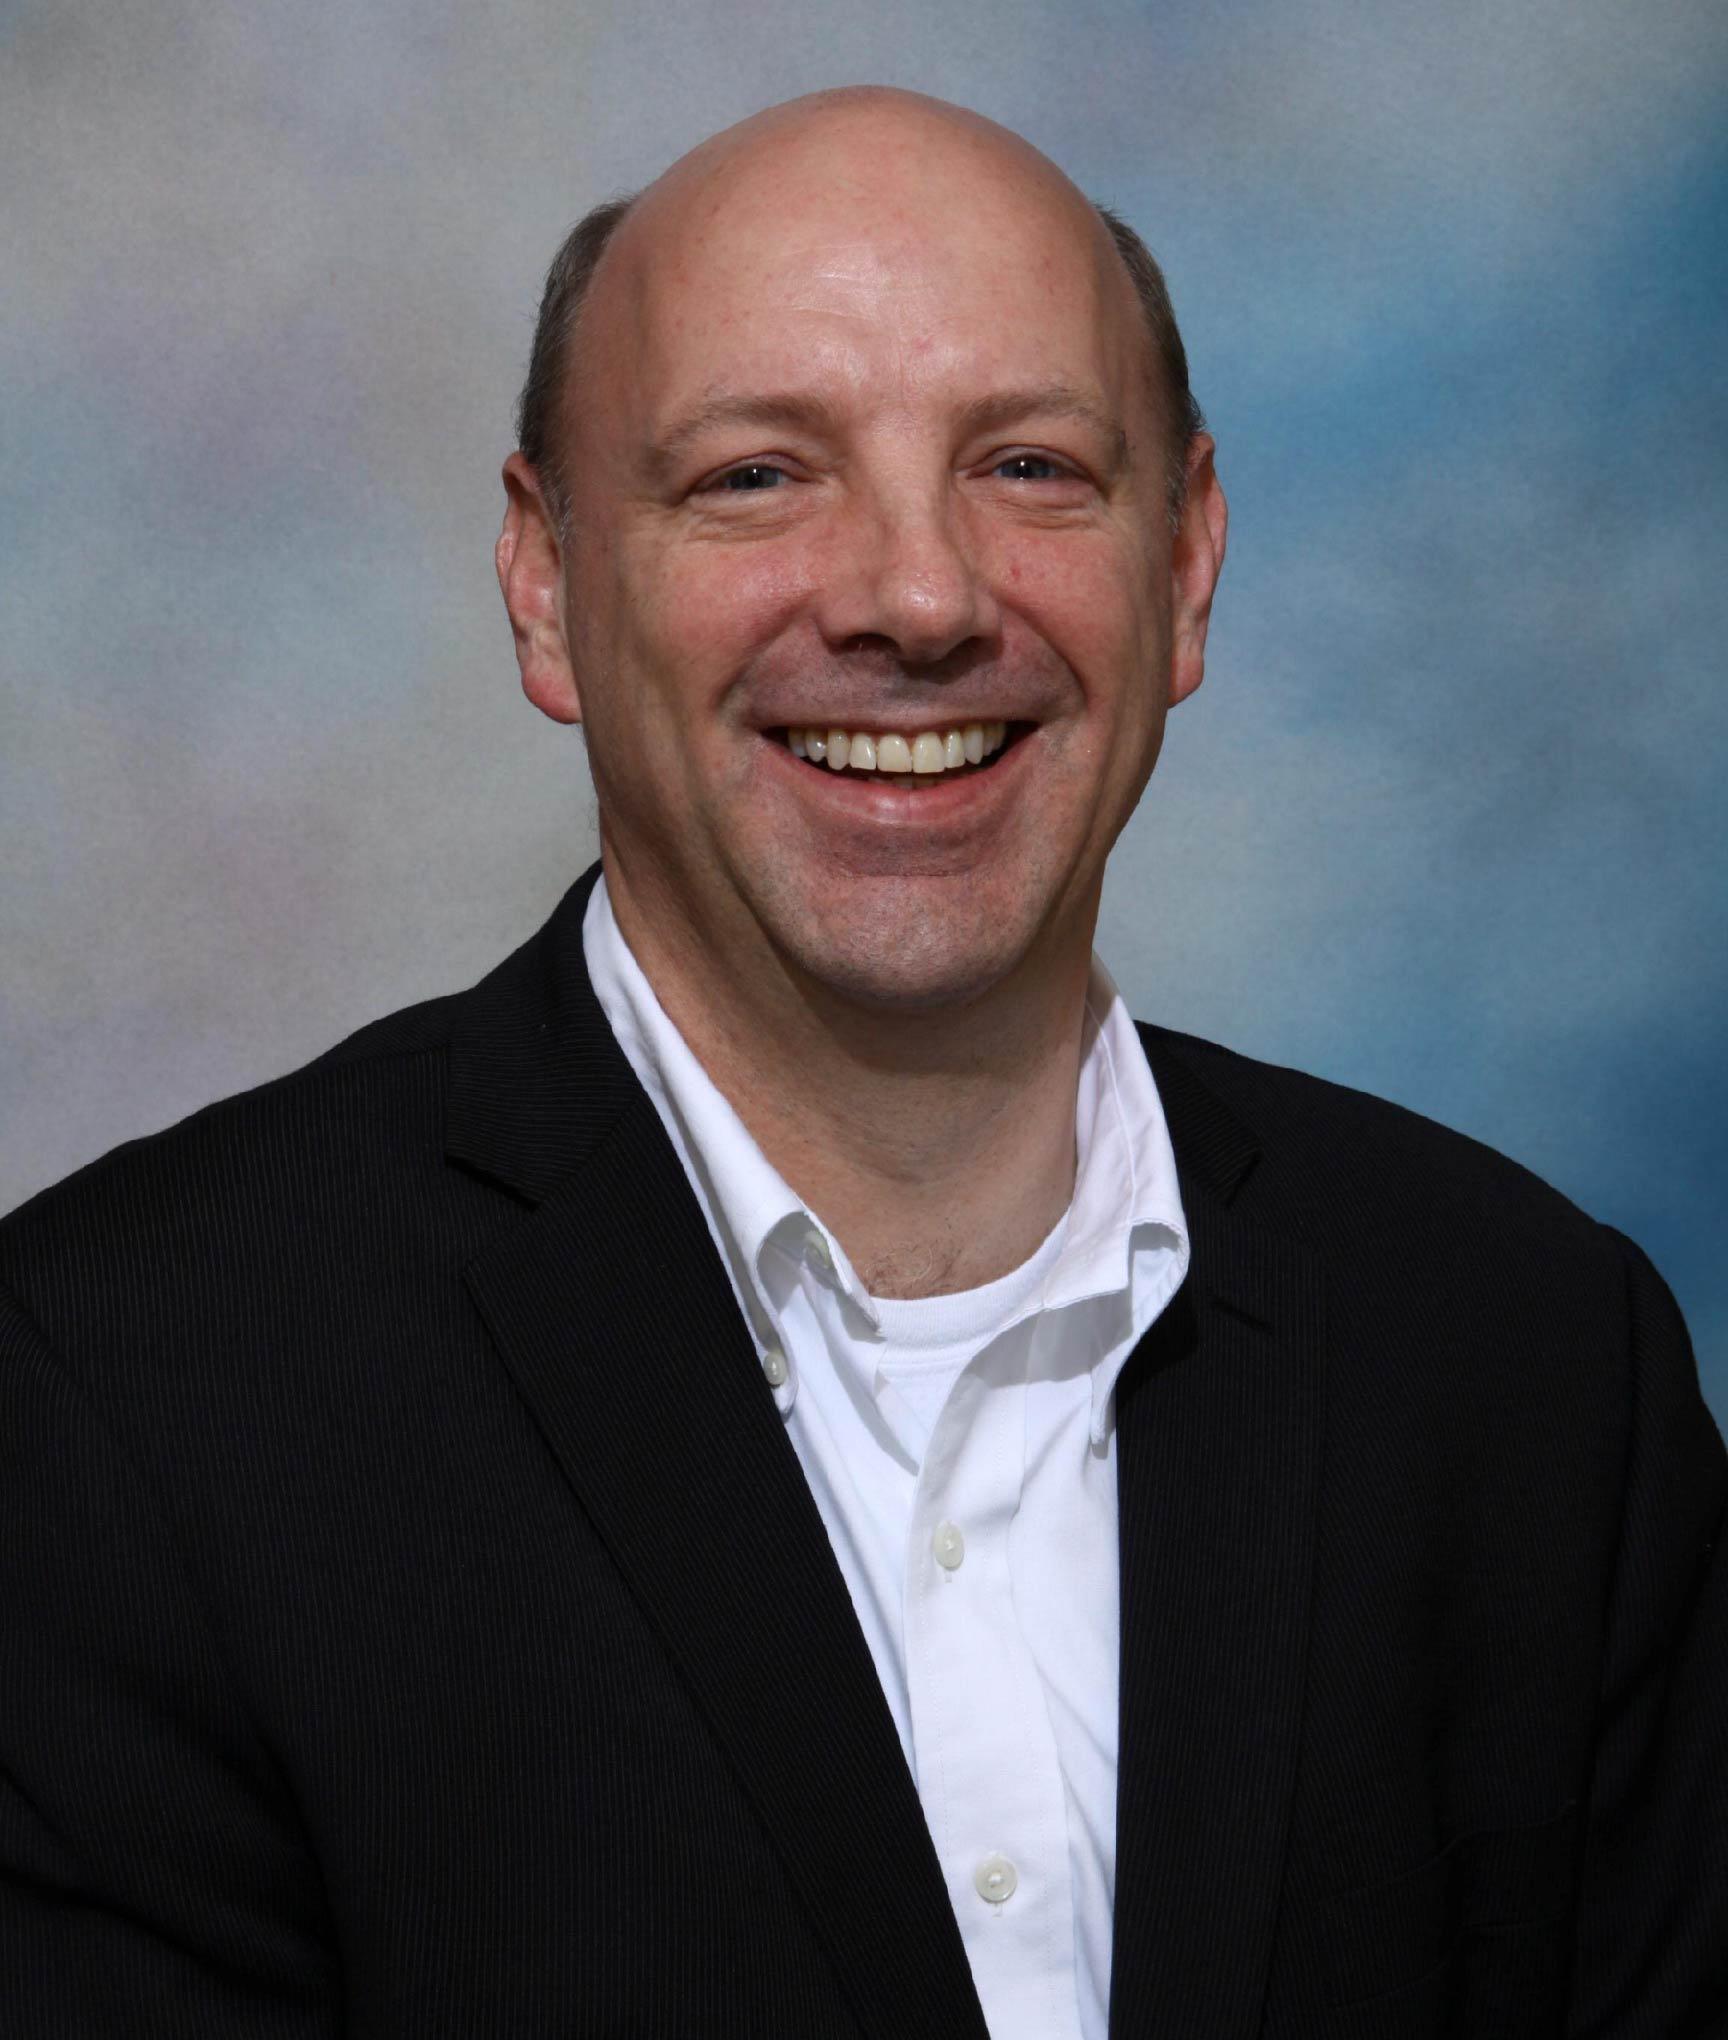 Joseph Hickey, CEO - Nova Communications